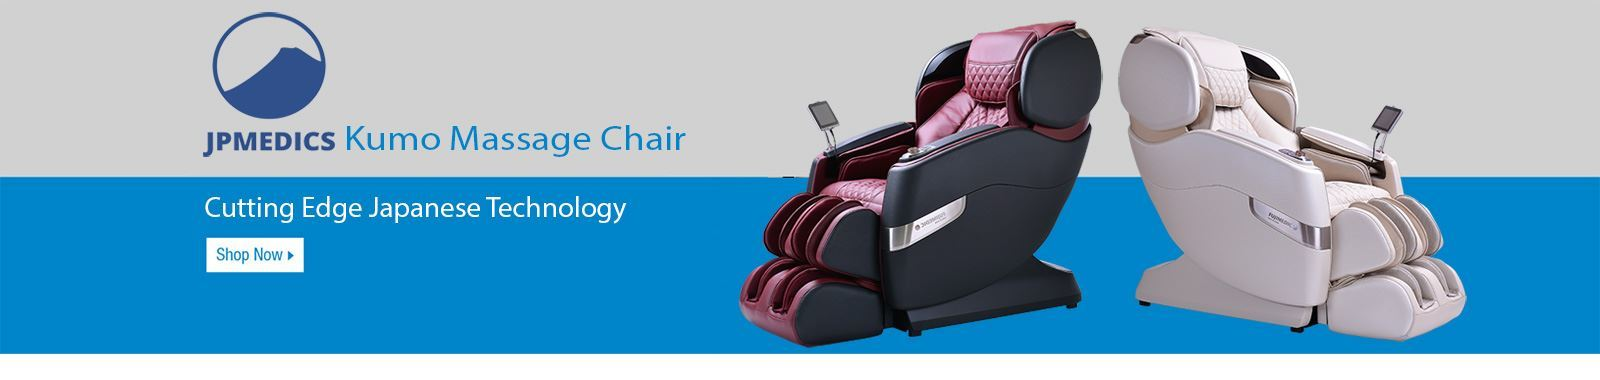 JPMedic Kumo massage chair promotional banner